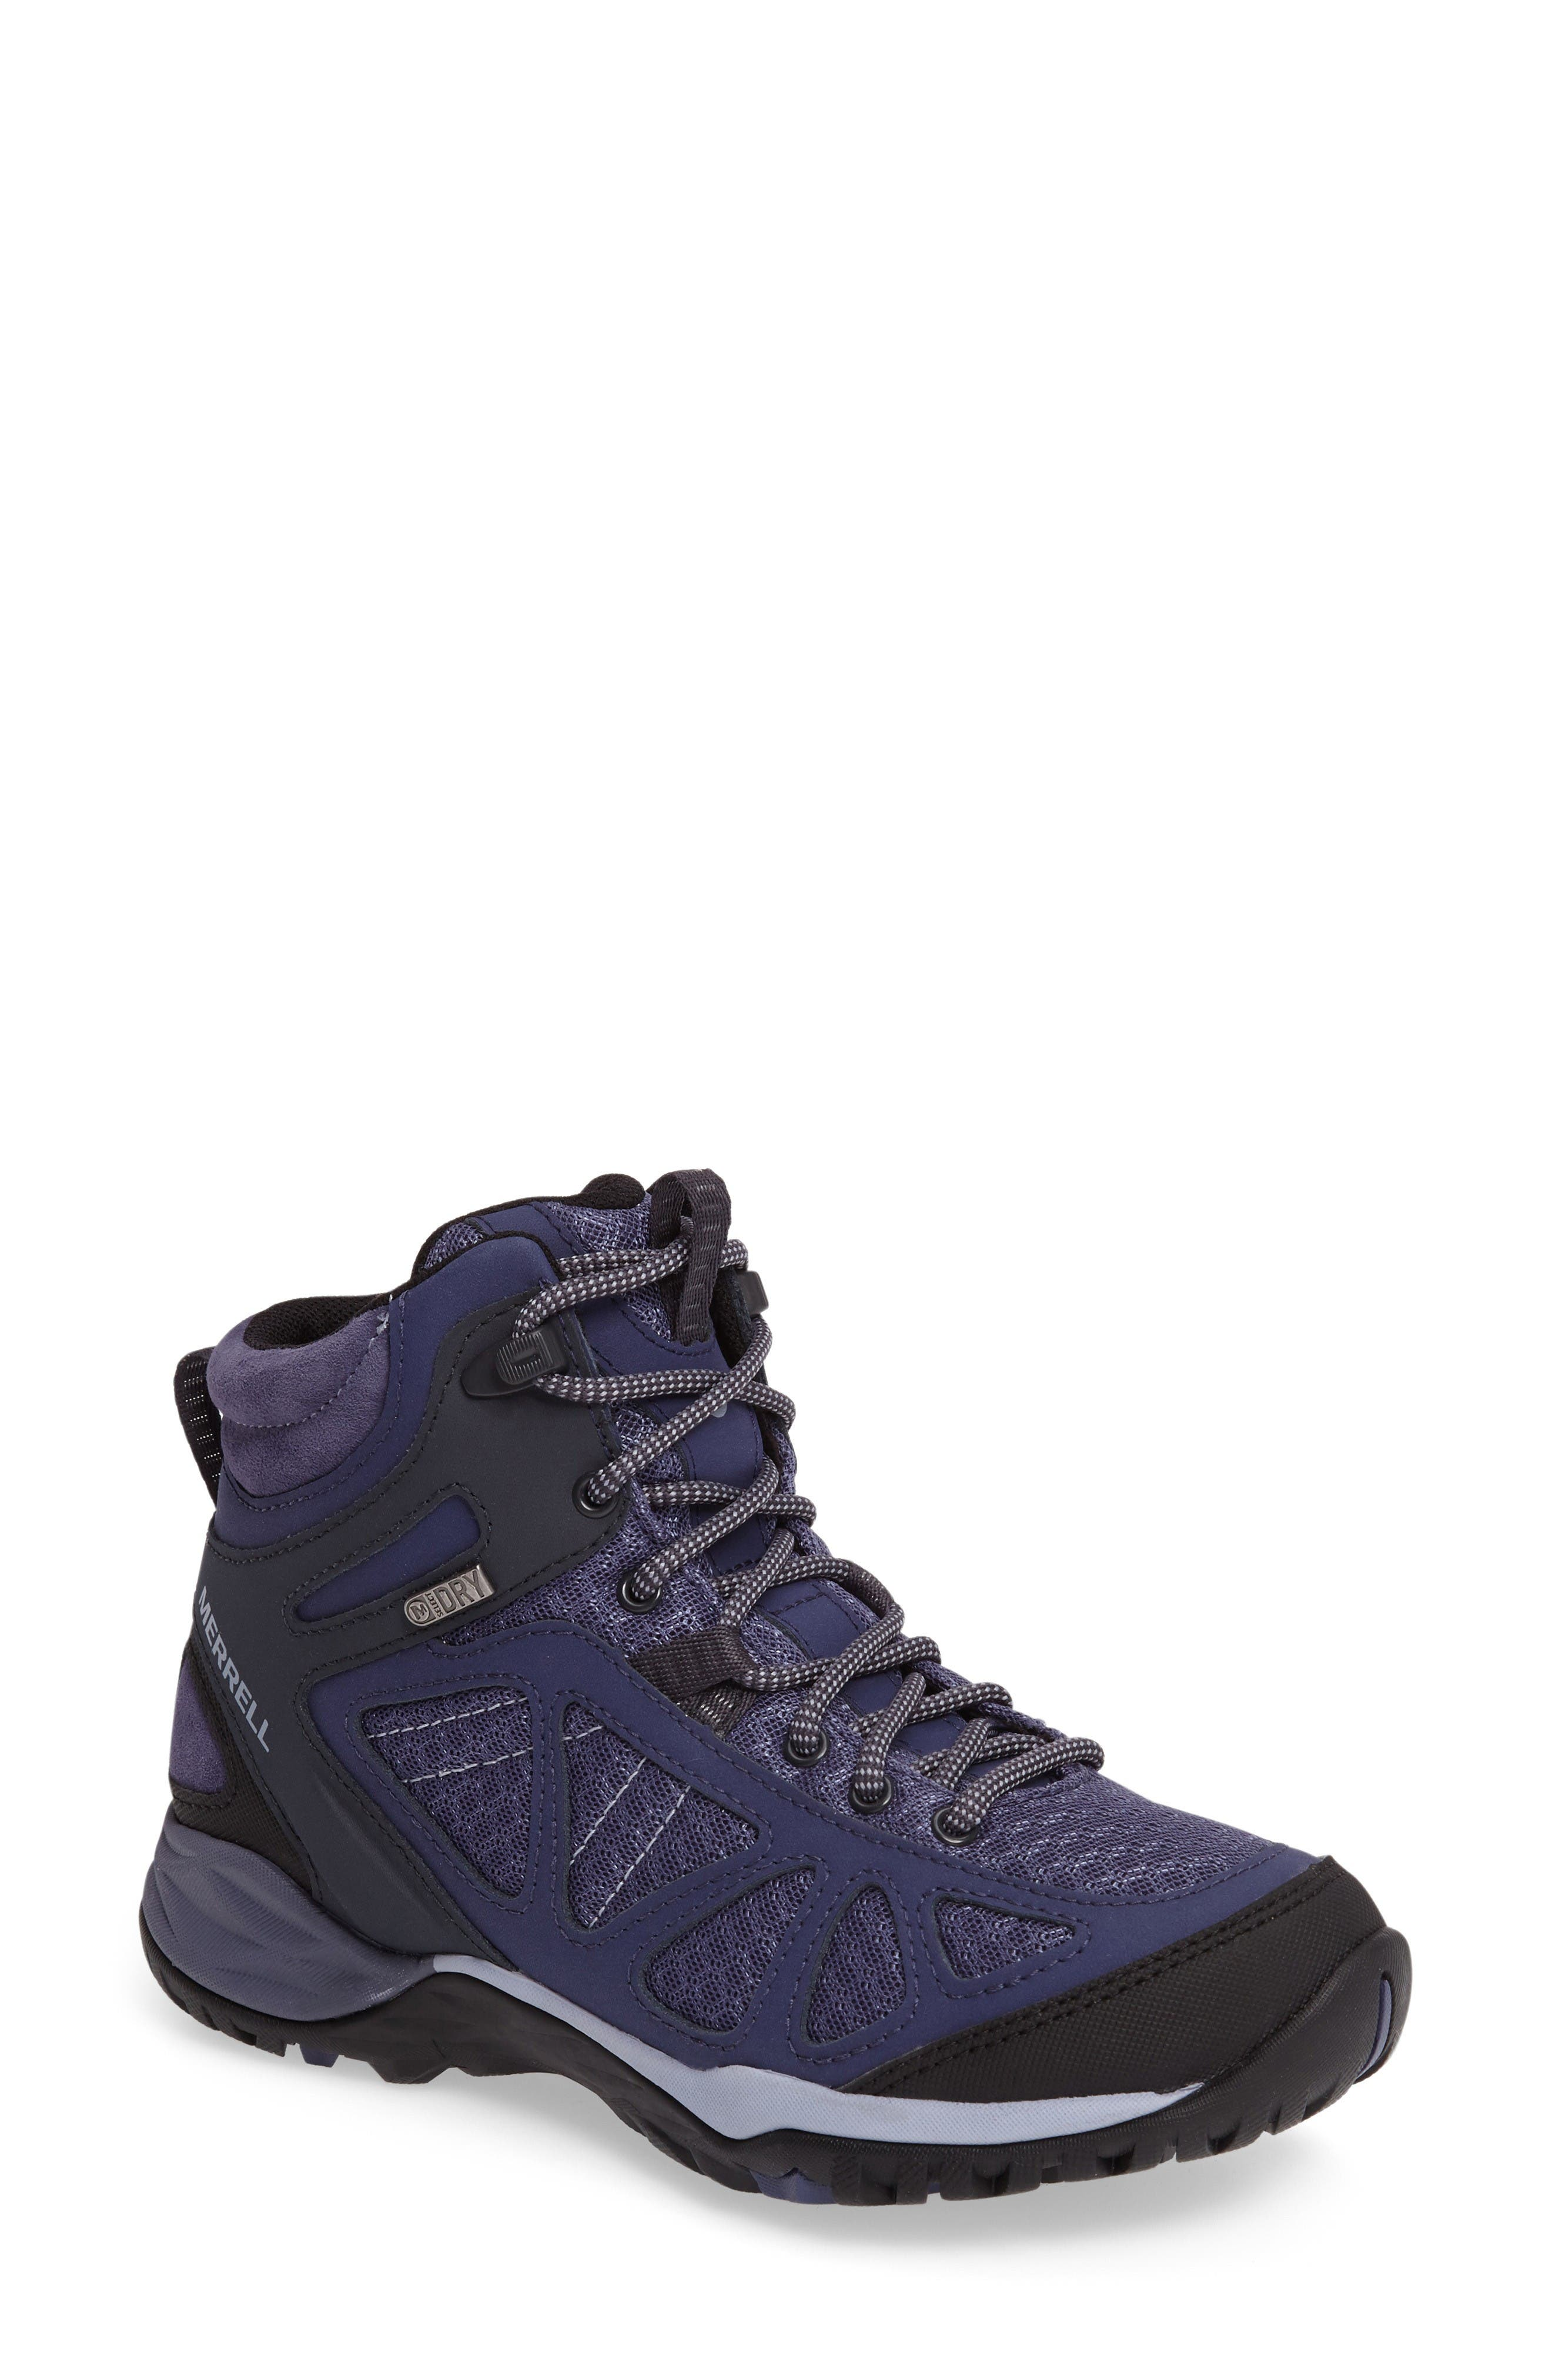 Siren Sport Q2 Waterproof Mid Top Sneaker,                             Main thumbnail 1, color,                             Crown Blue Nubuck Leather